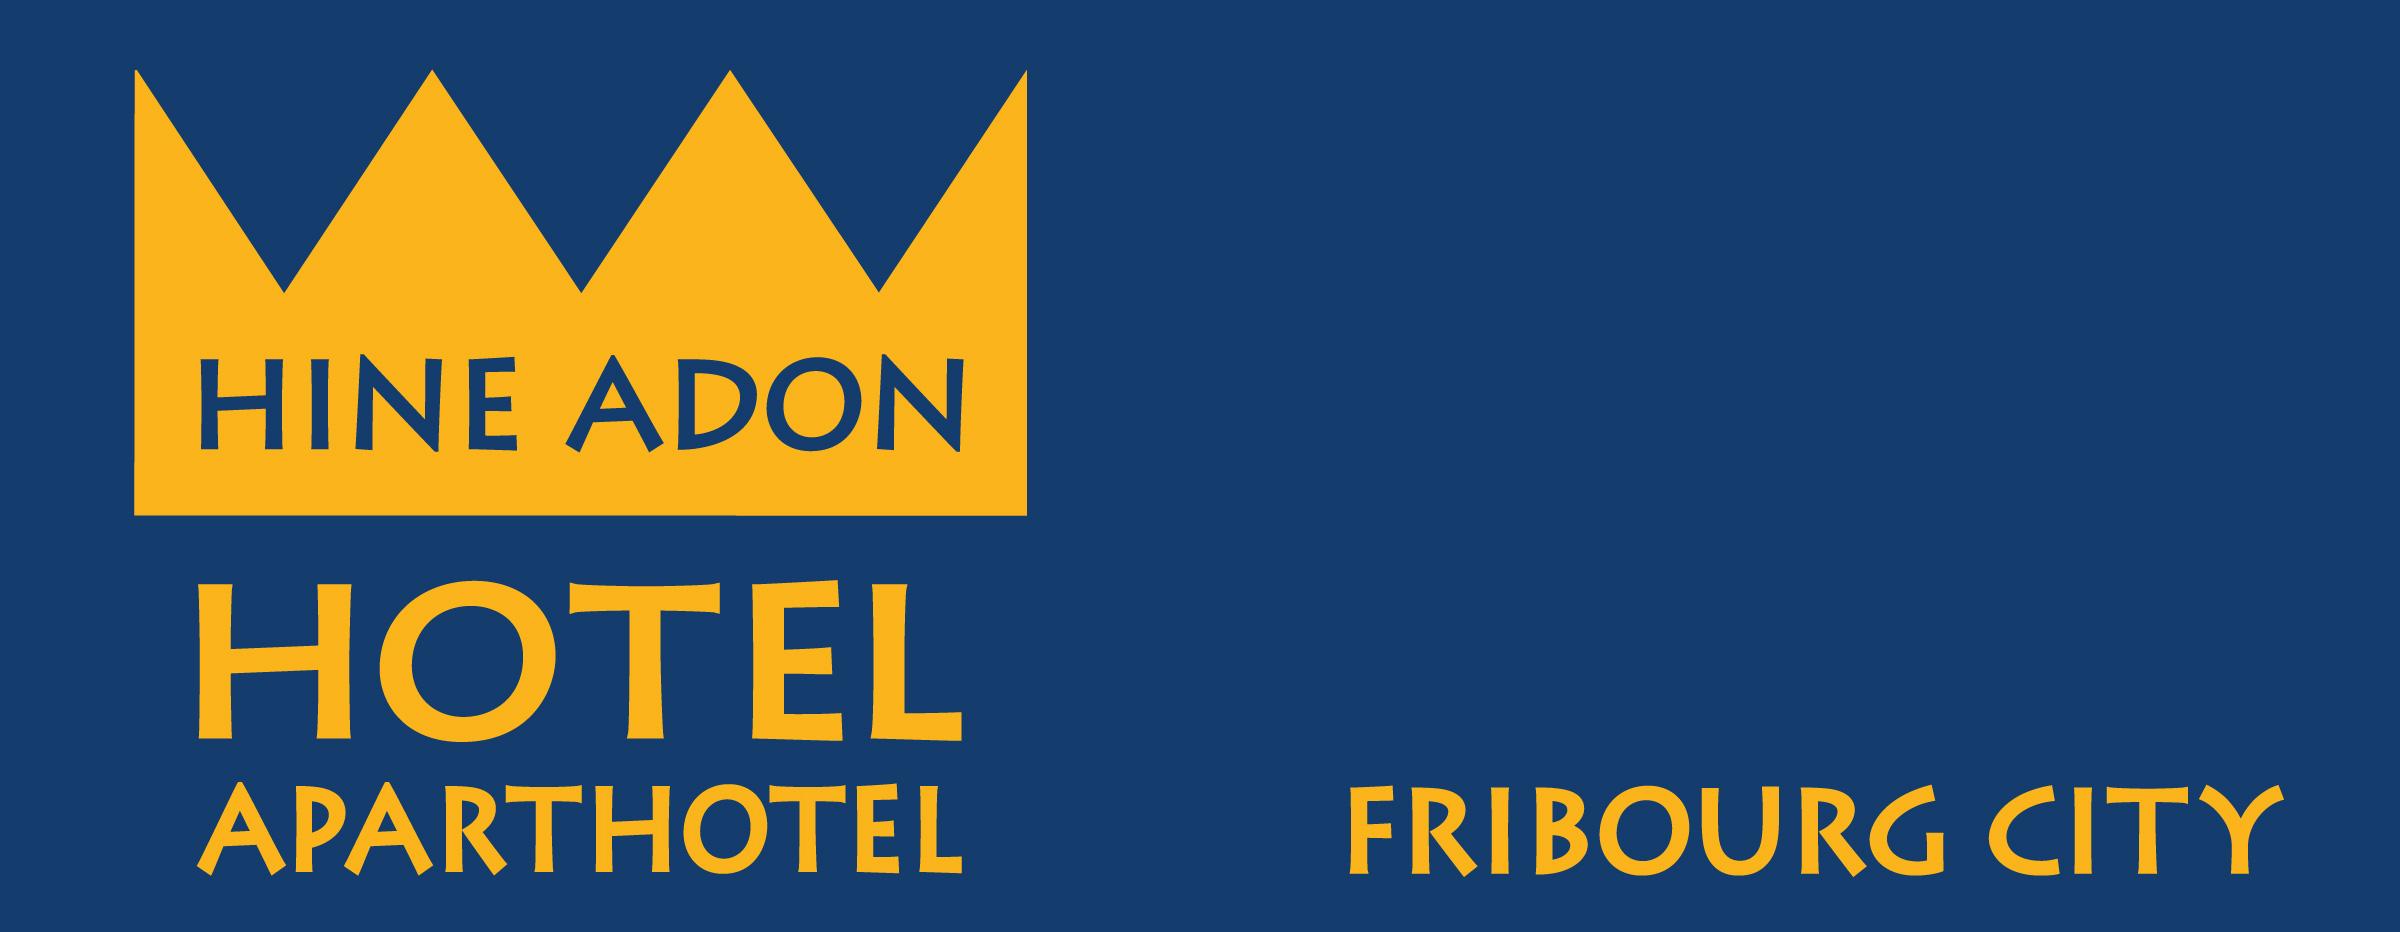 https://www.fcrichemond.ch/wp-content/uploads/2021/07/Logo_Hine-Adon_Hotel_Aparthotel_Fribourg_City_bl_CMYK_18x7_2400x932.jpg